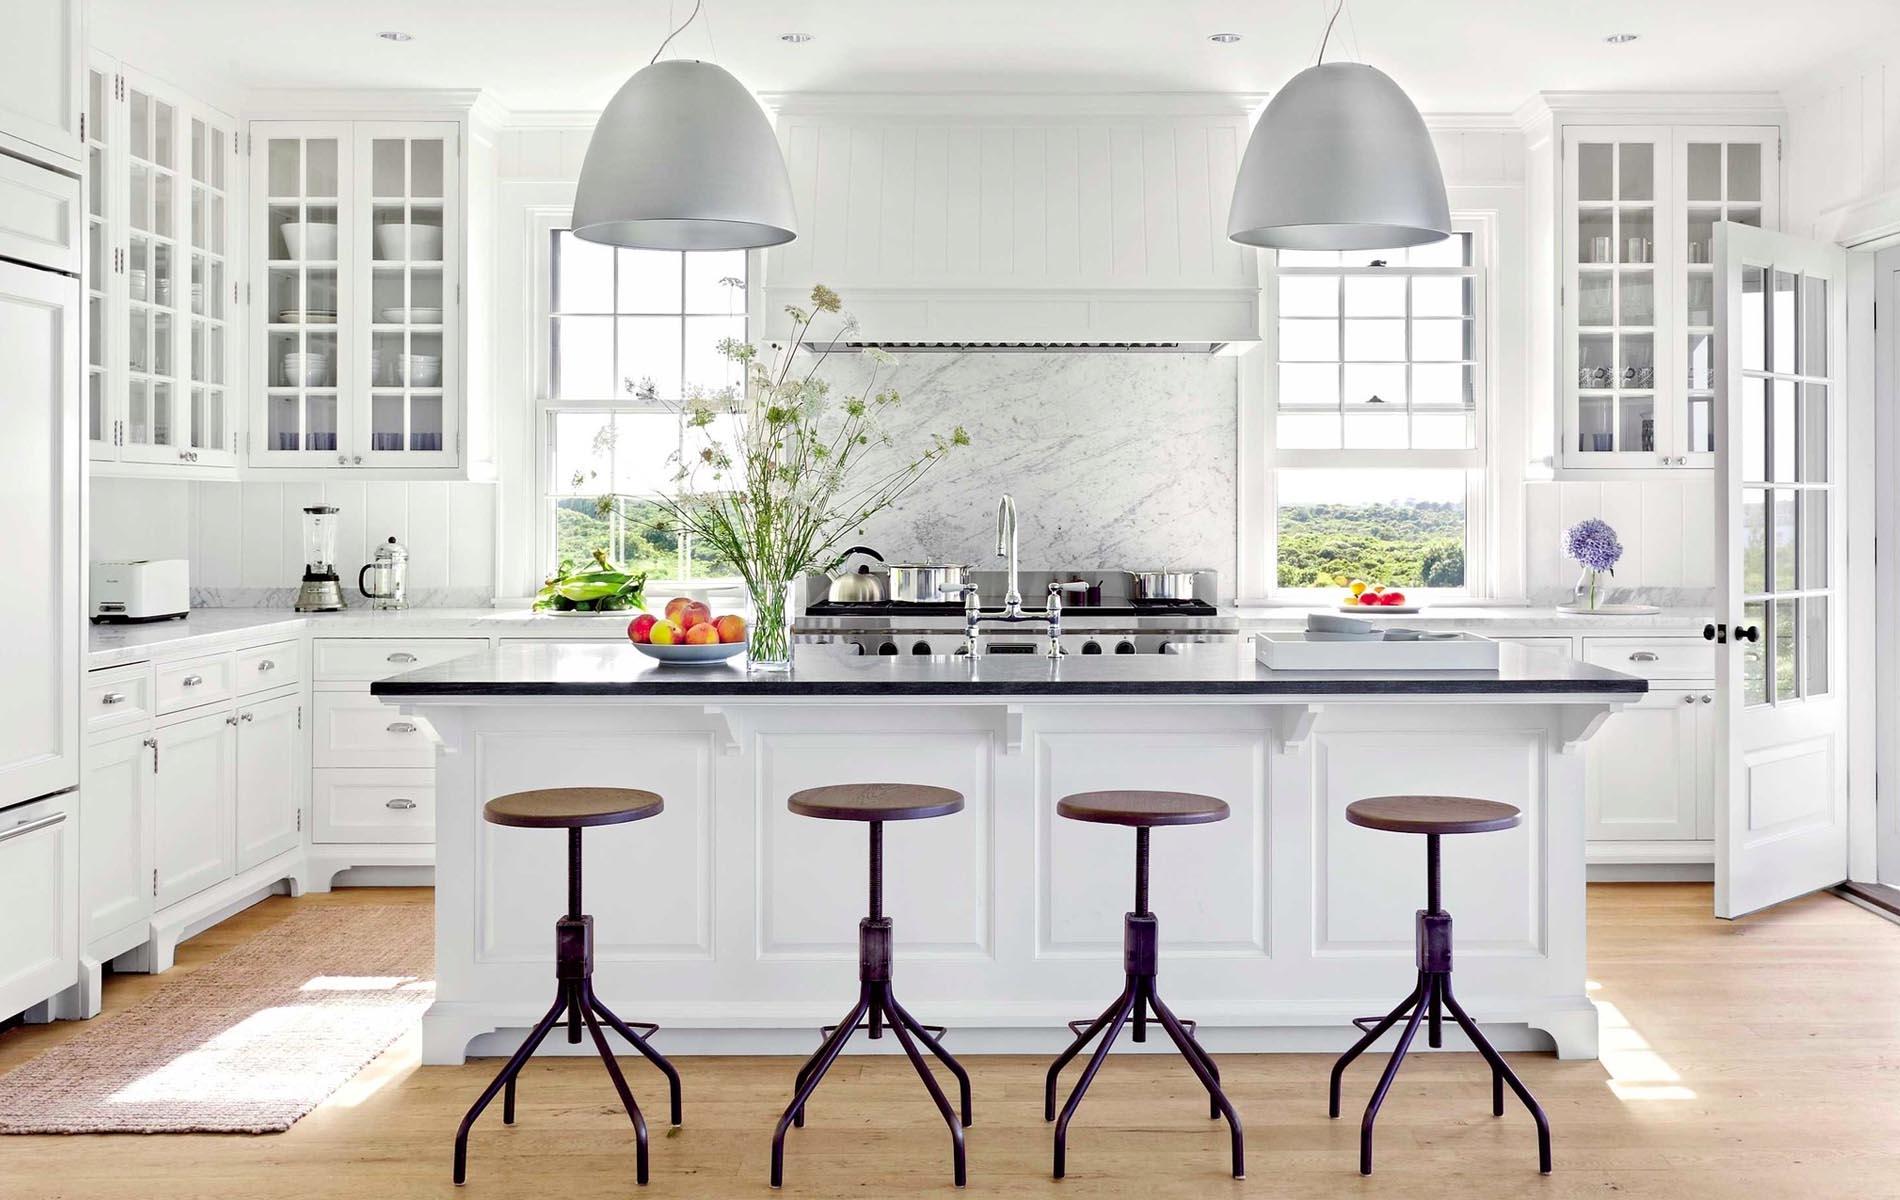 ZORO Wohndesign: Innenraumgestaltung, Küche, Bad, Montage, Planung ...